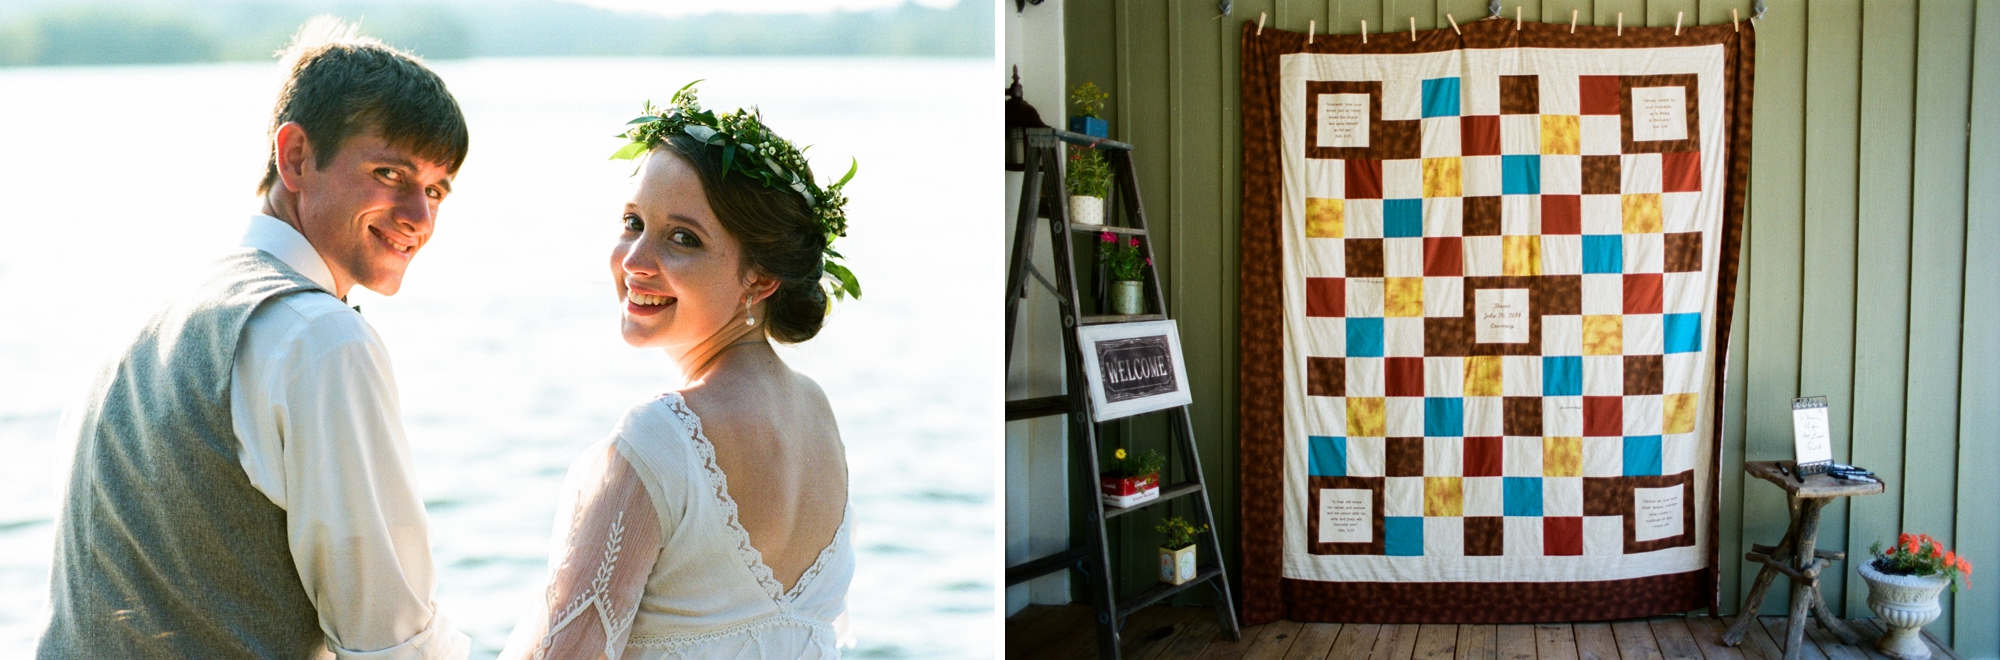 smith lake wedding_0097